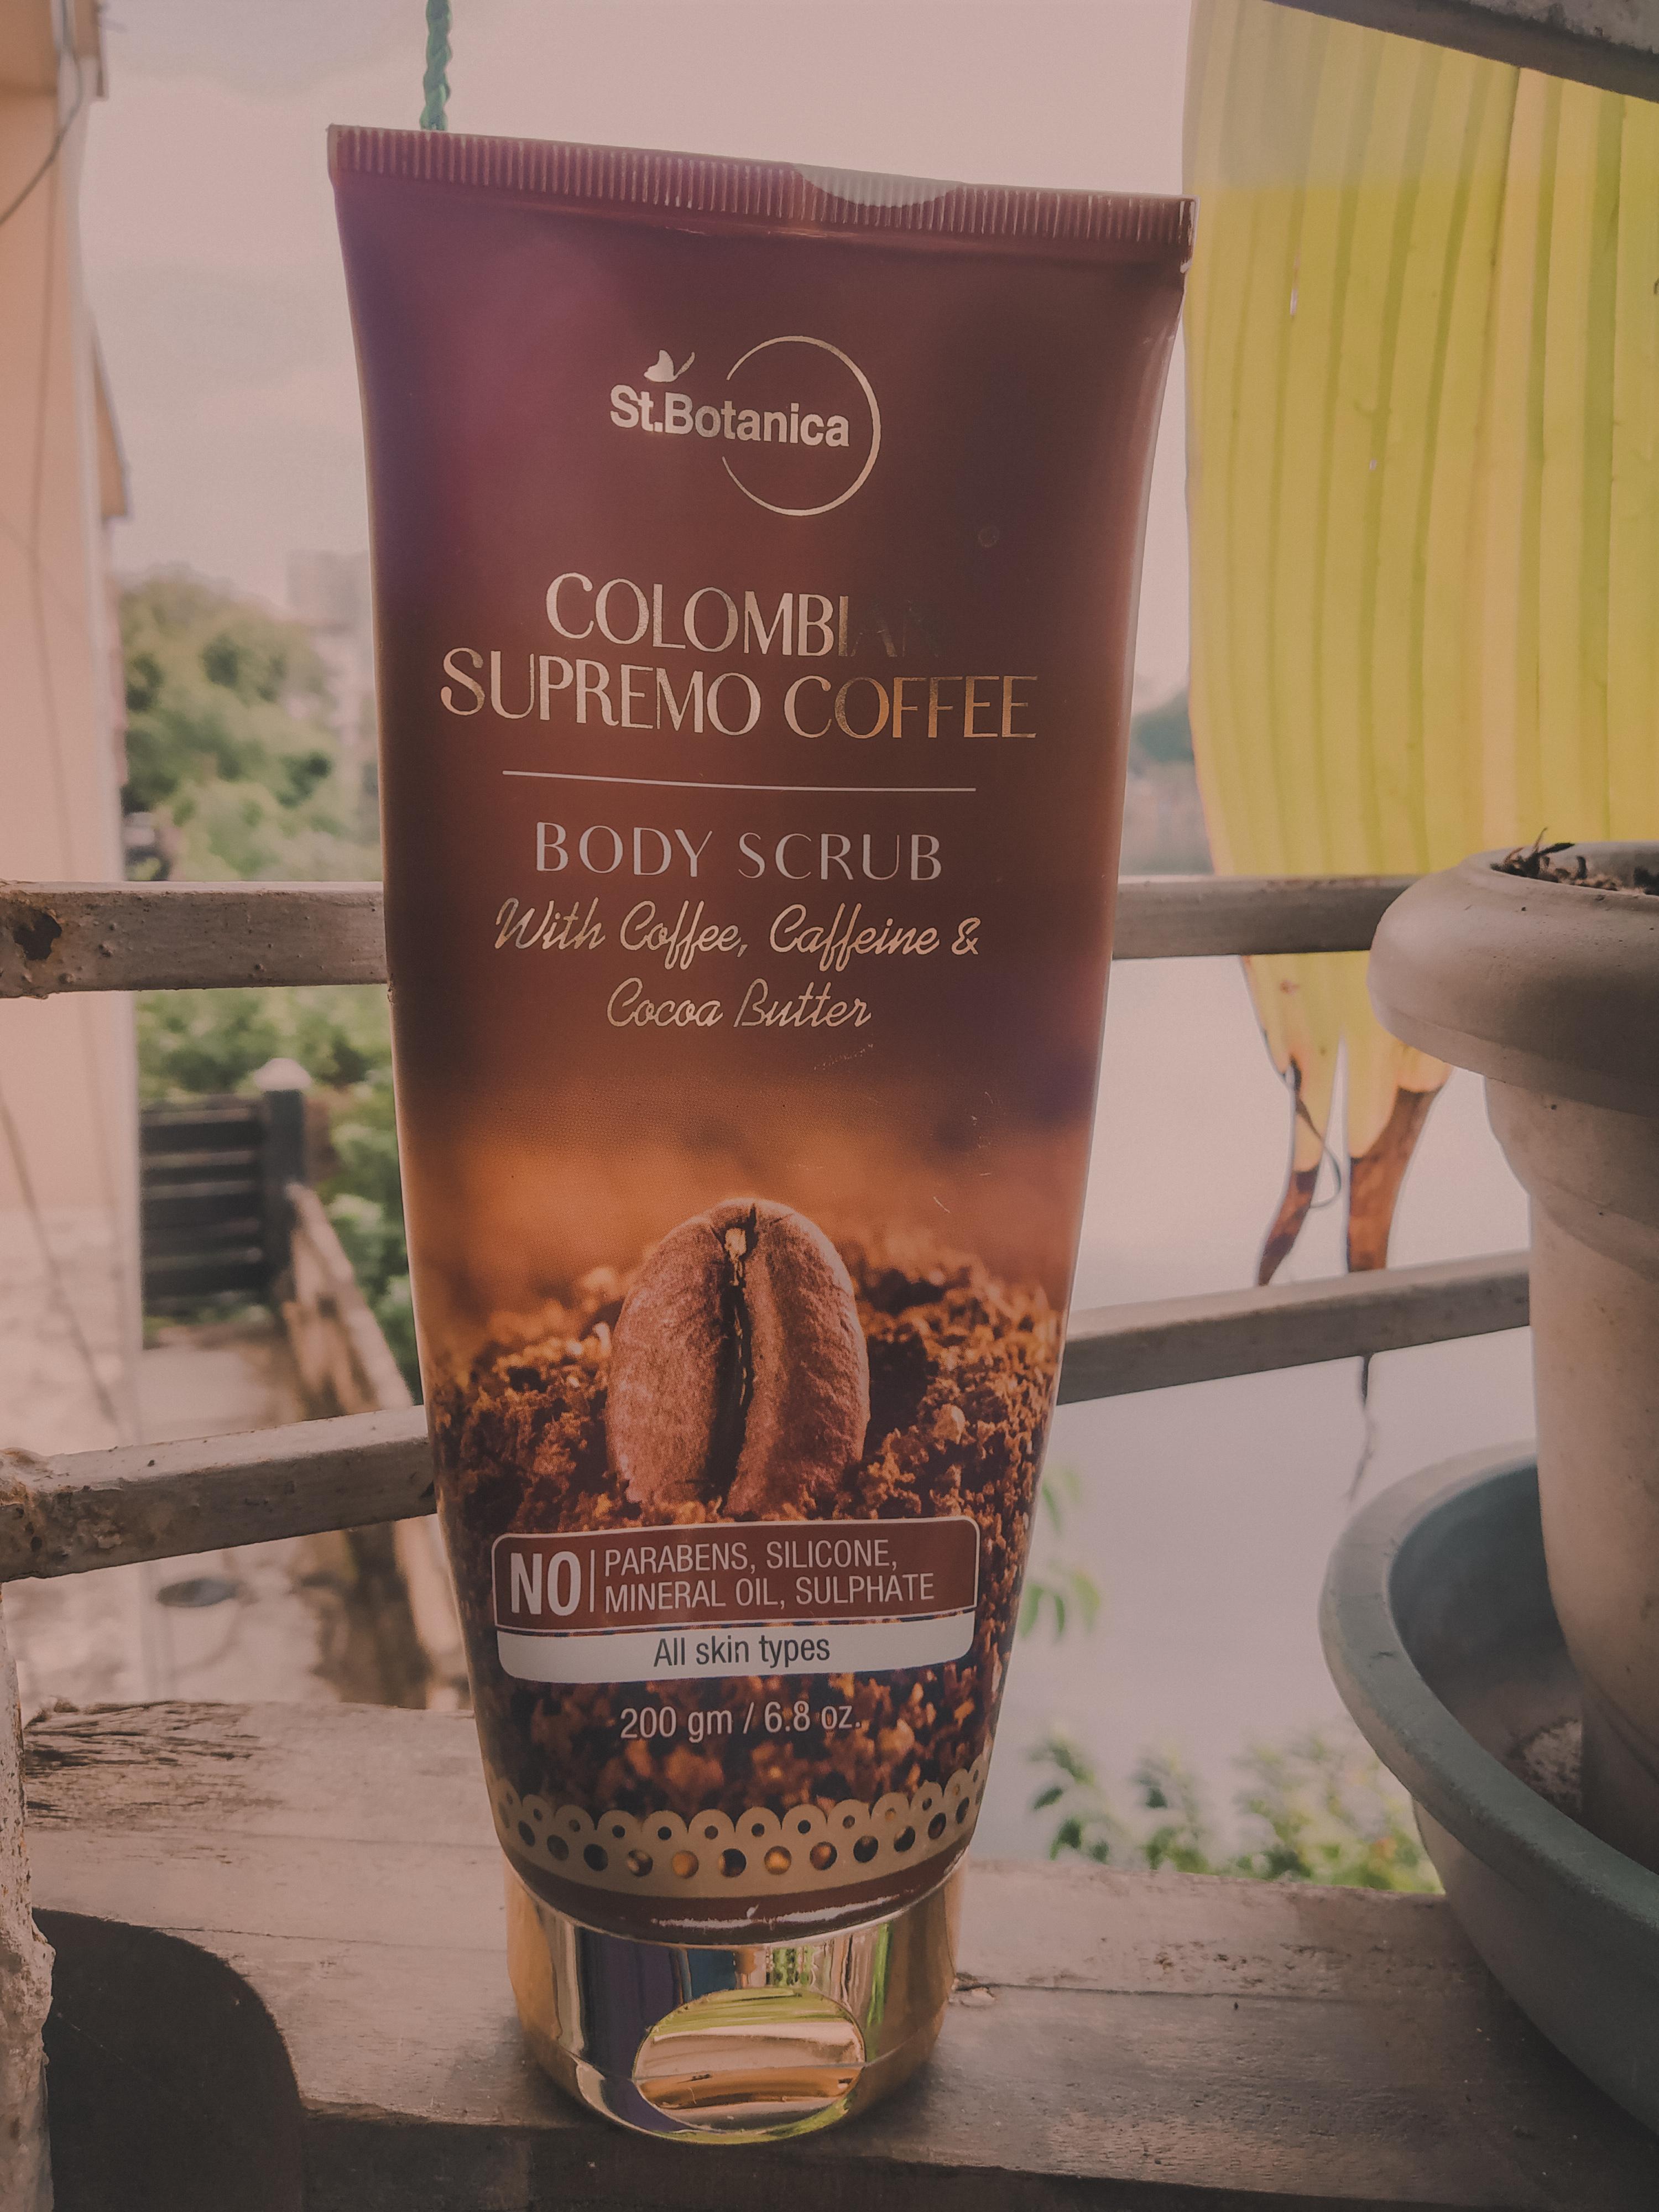 St.Botanica Colombian Supremo Coffee Body Scrub pic 2-Amazing Body Scrub-By arunikakoley